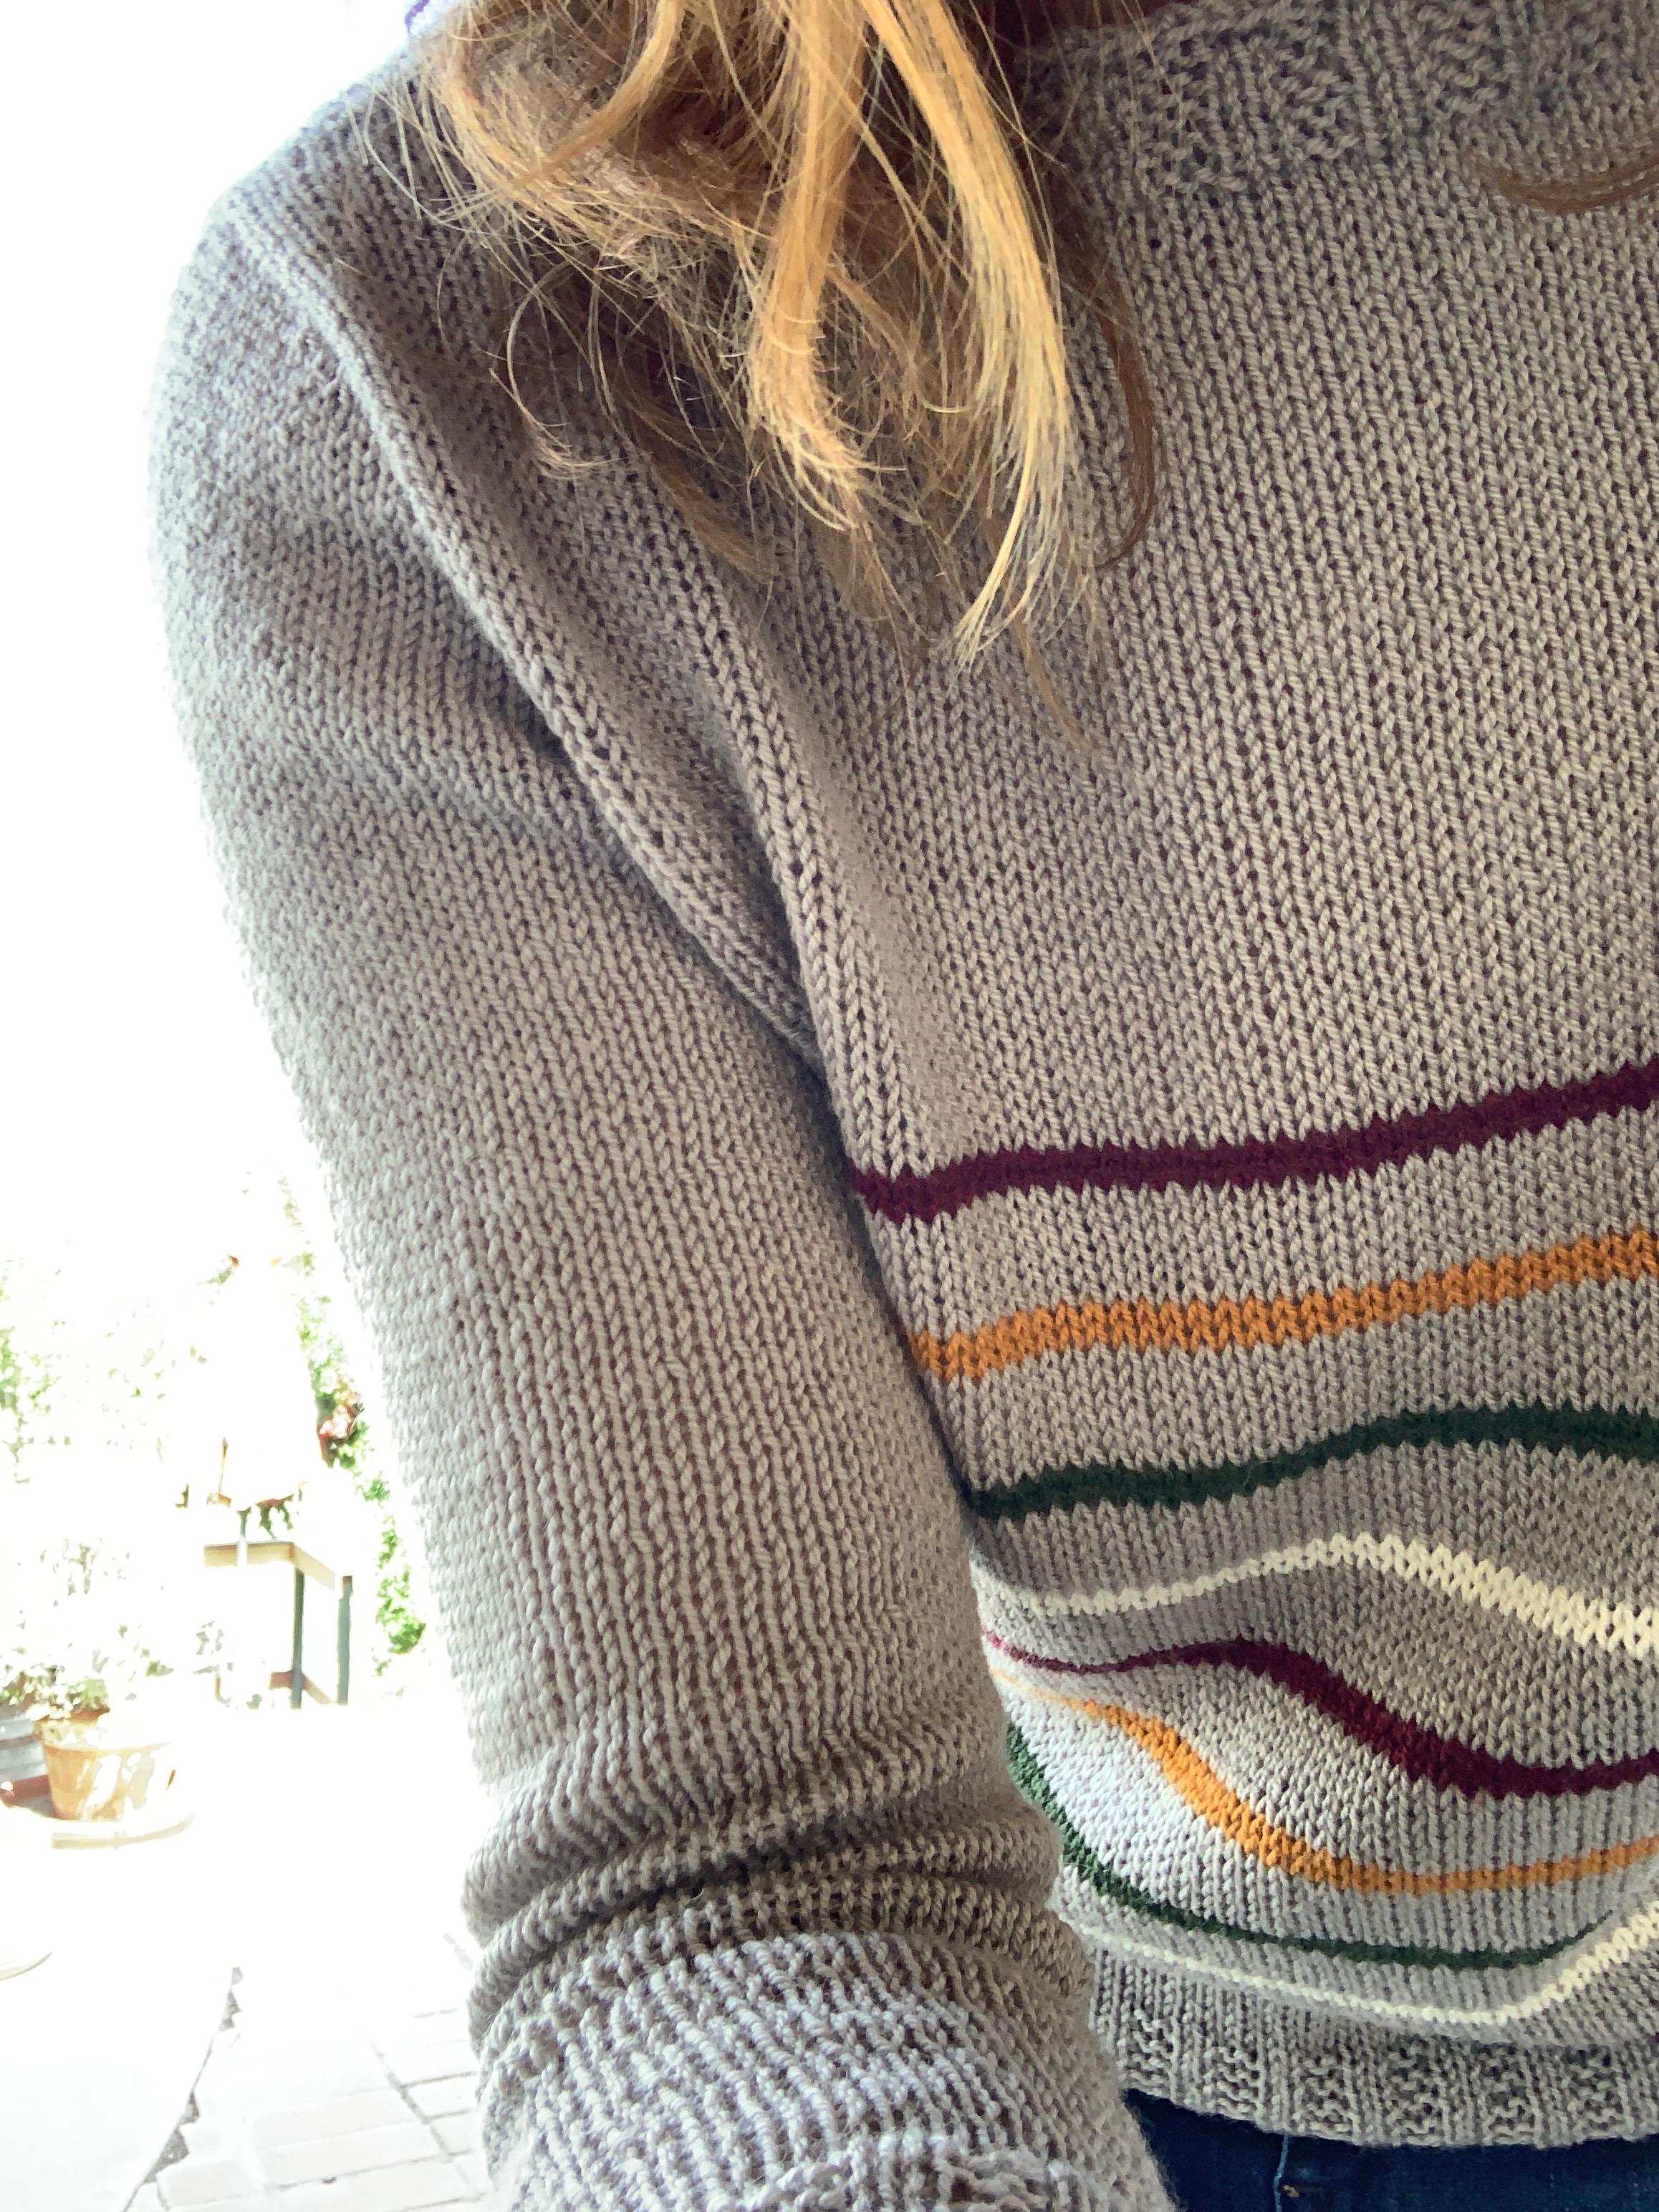 New sweater design coming in  Fluffy Fingering merino yarn